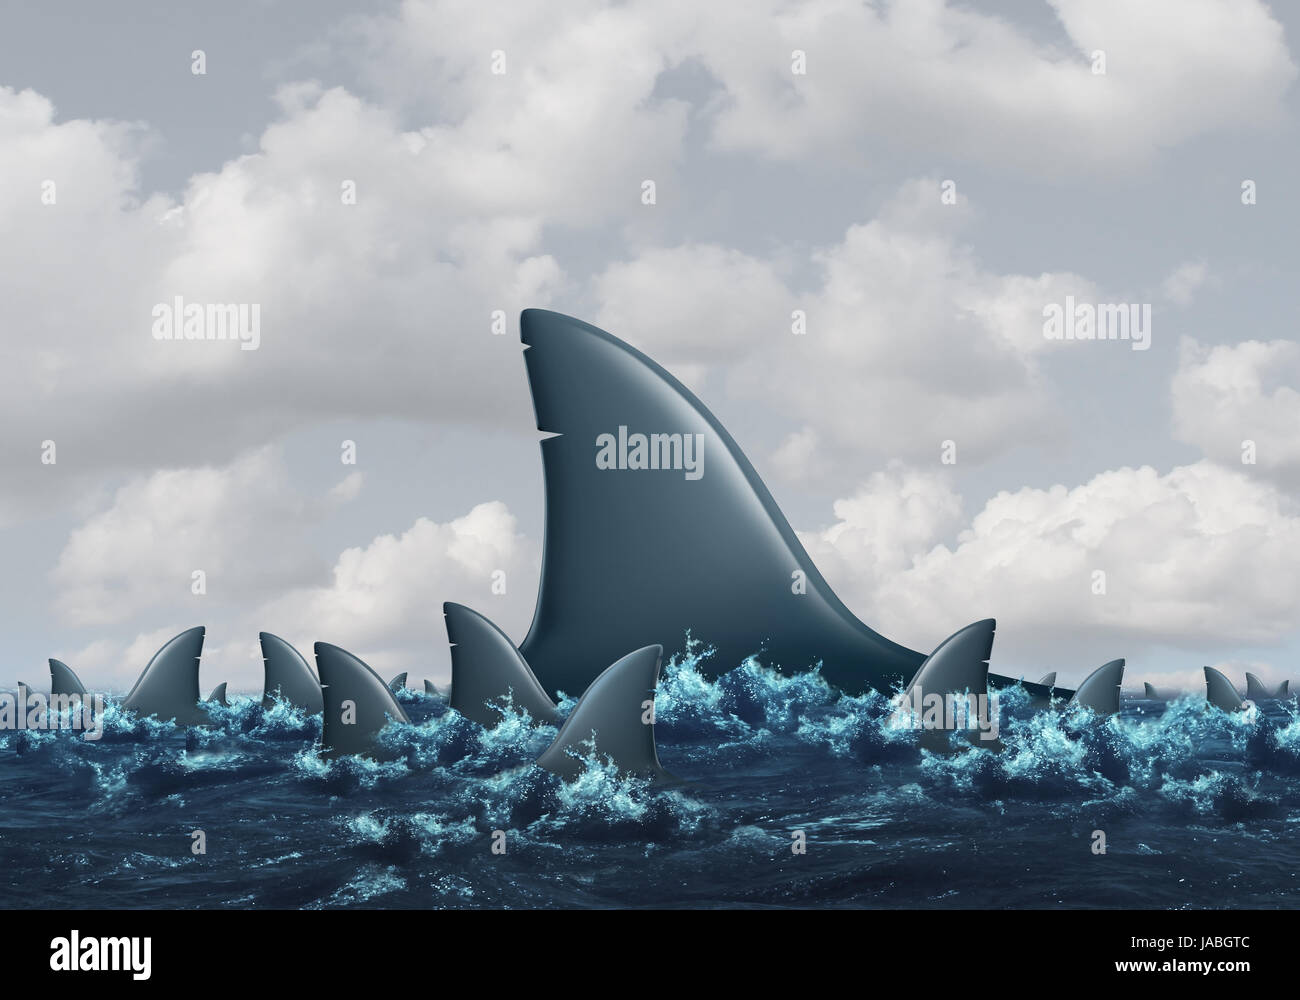 Big Fish Concept Business Metaphor As A Group Of Smaller Sharks